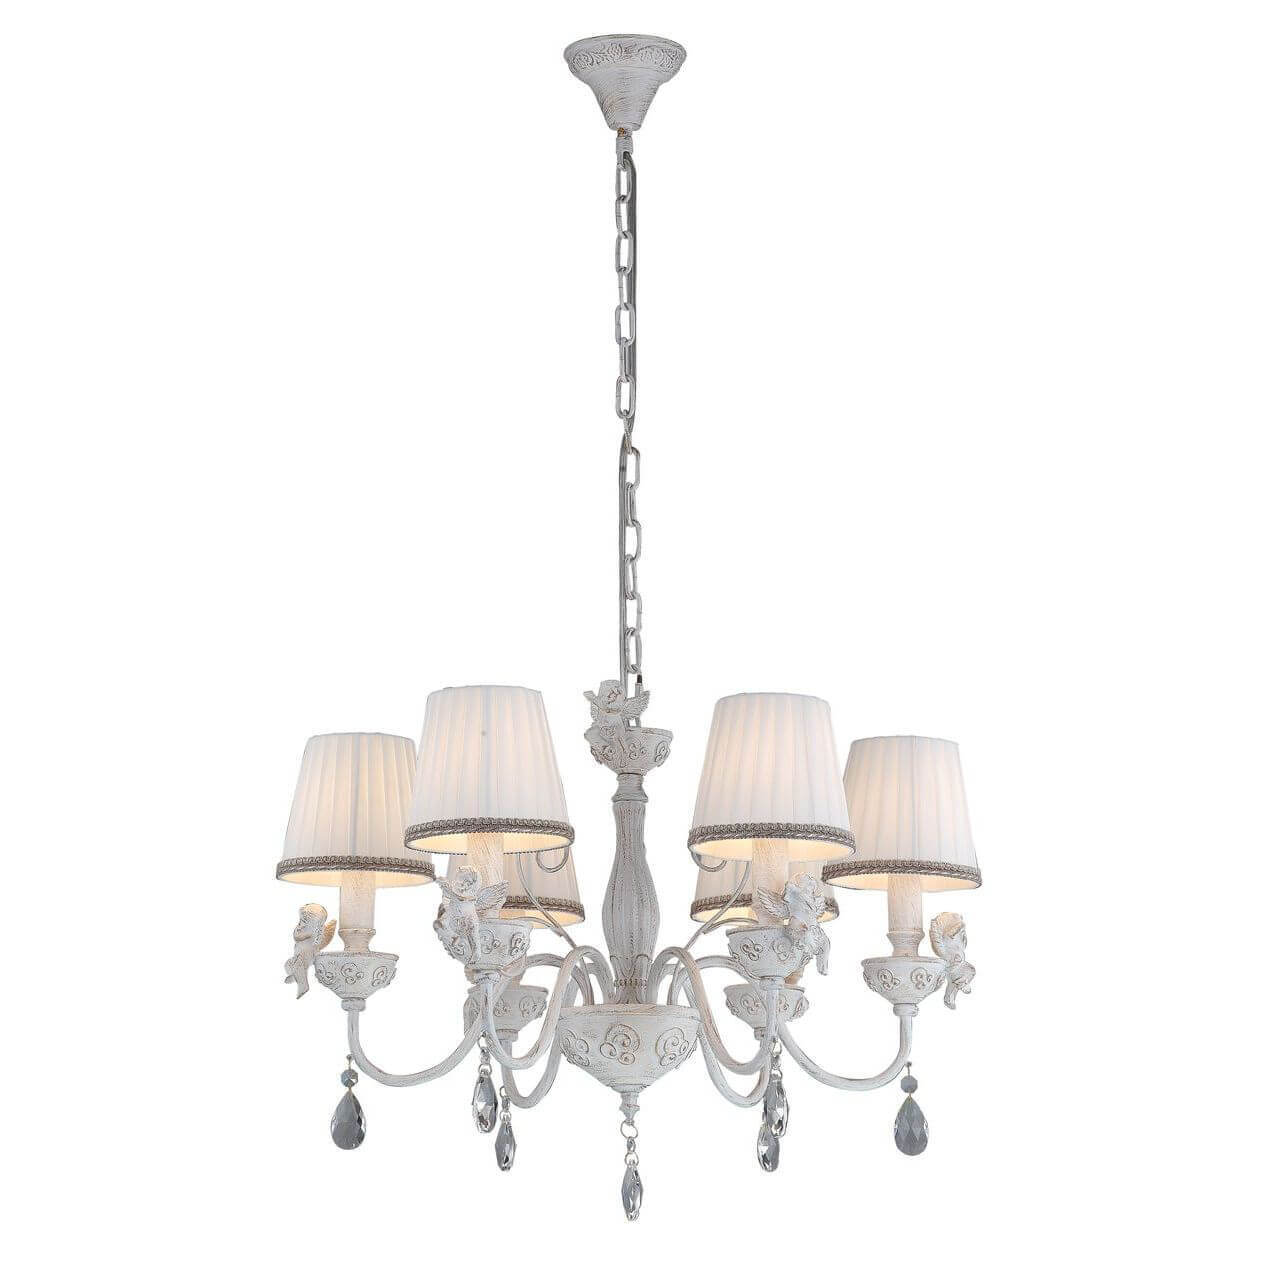 Подвесная люстра Arte Lamp Сherubino A5656LM-6WG все цены